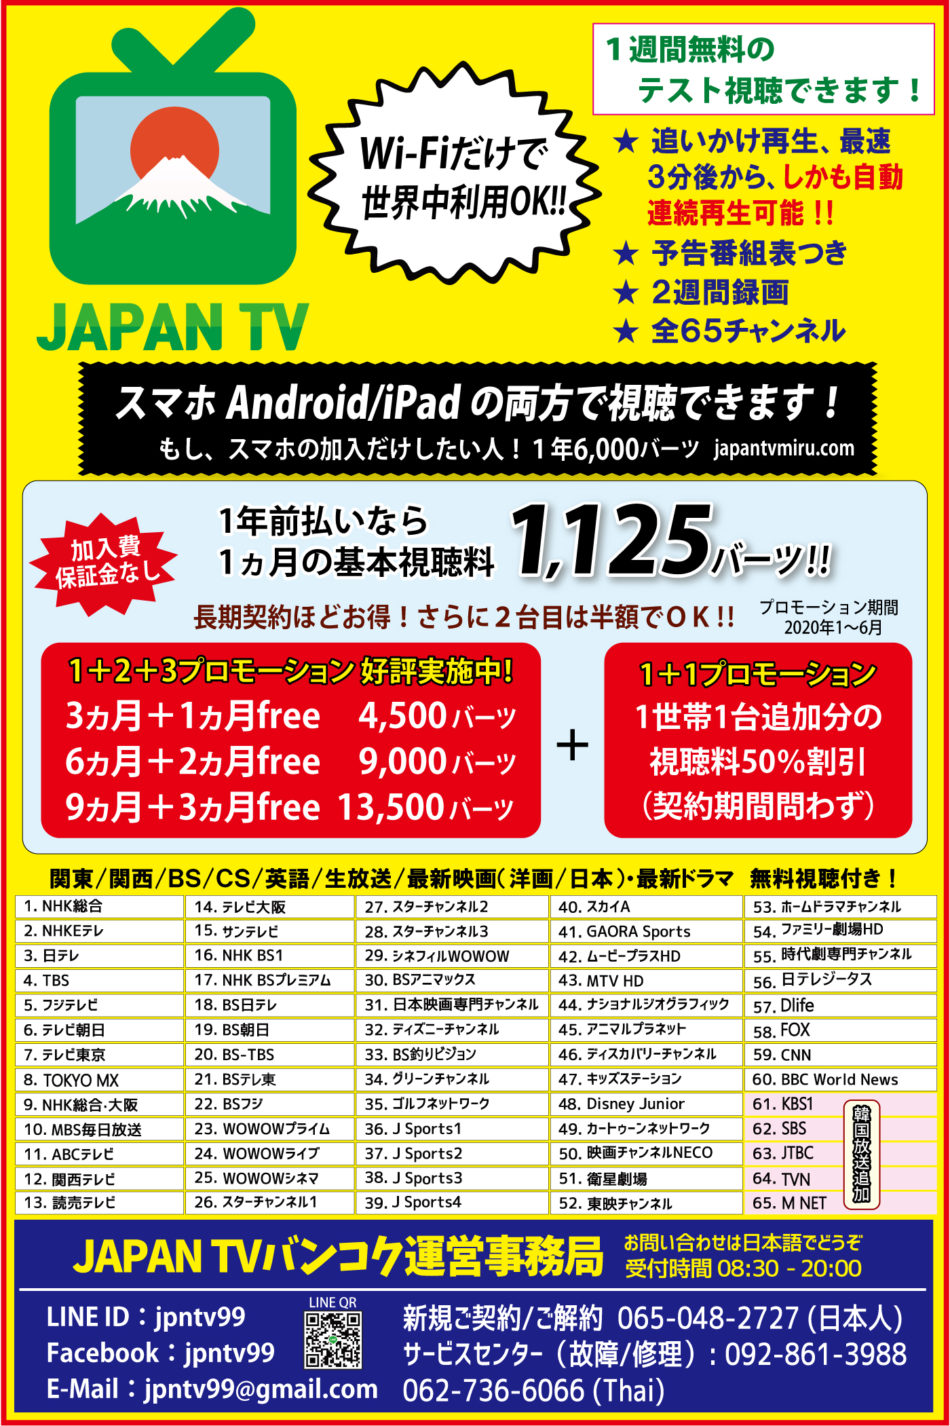 JAPAN TVの広告